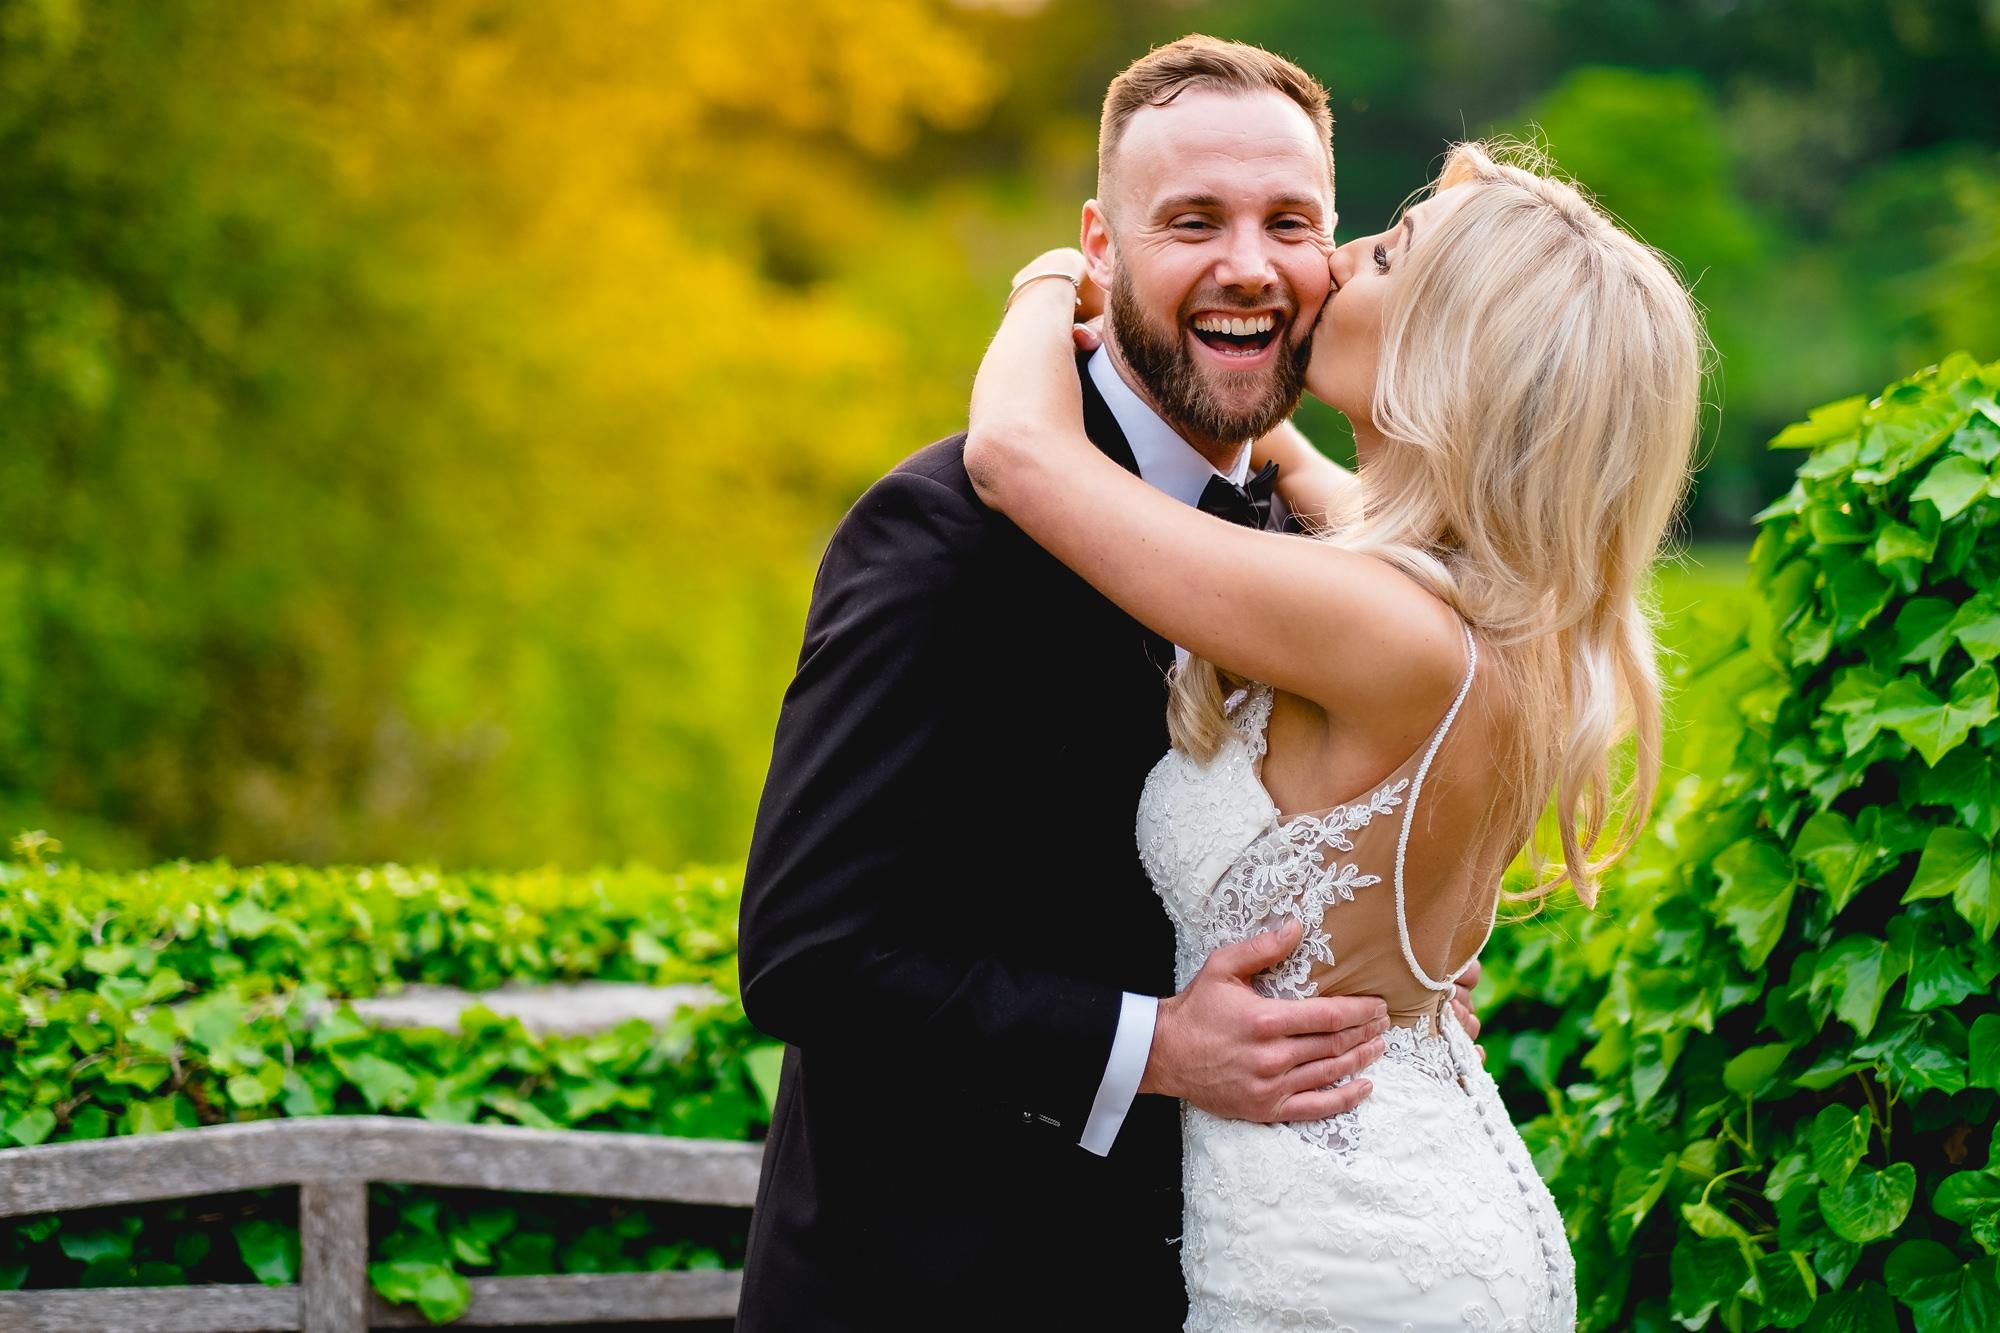 Mitton-Hall-Wedding-Photographer_0025.jpg